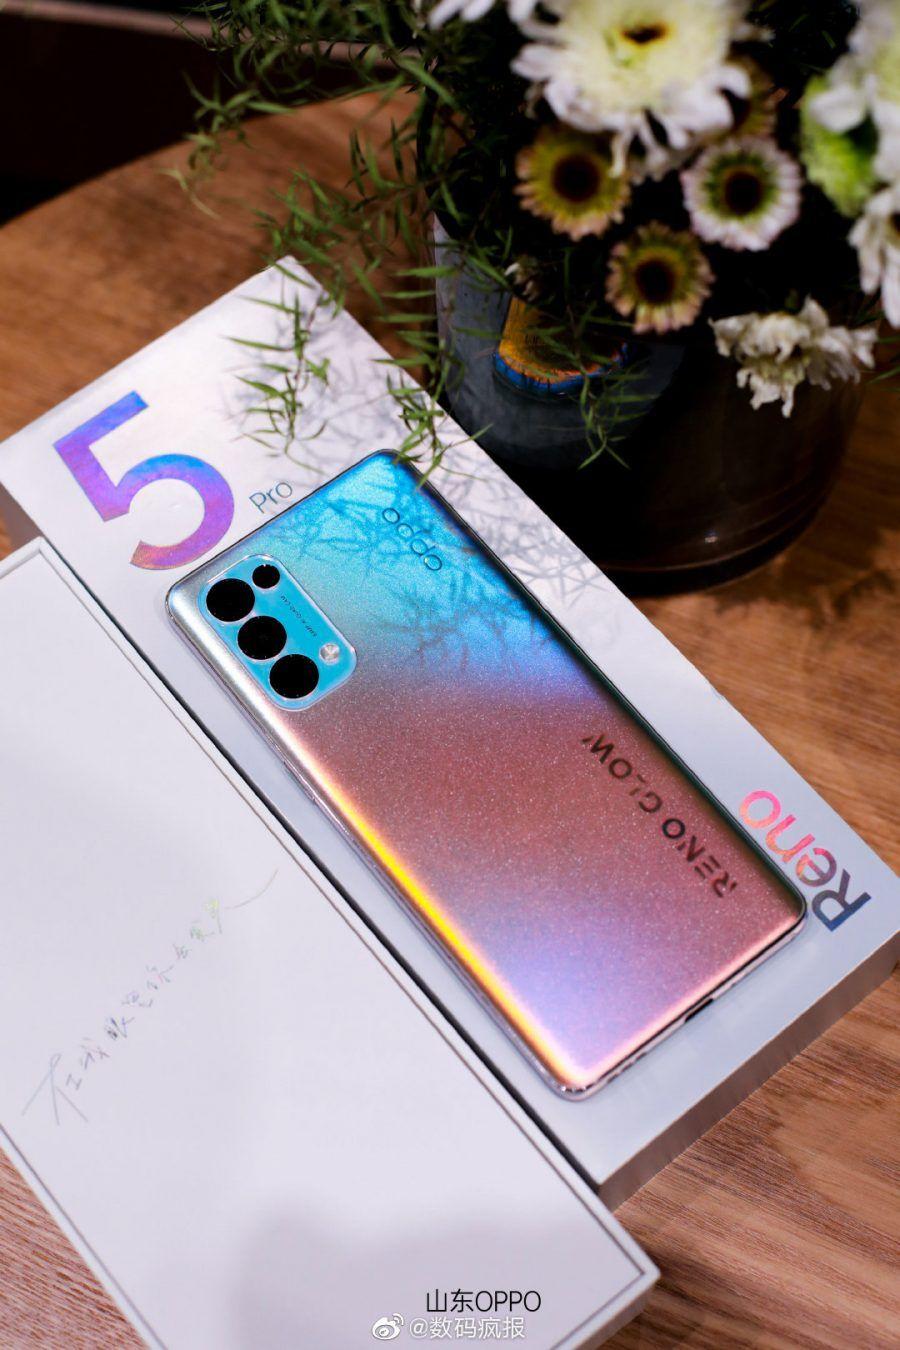 Reno5Pro 2 Android 11, china, gama-média, imagens reais, oppo, OPPO Reno 5, Reno 5 Pro, smartphone, topo de gama